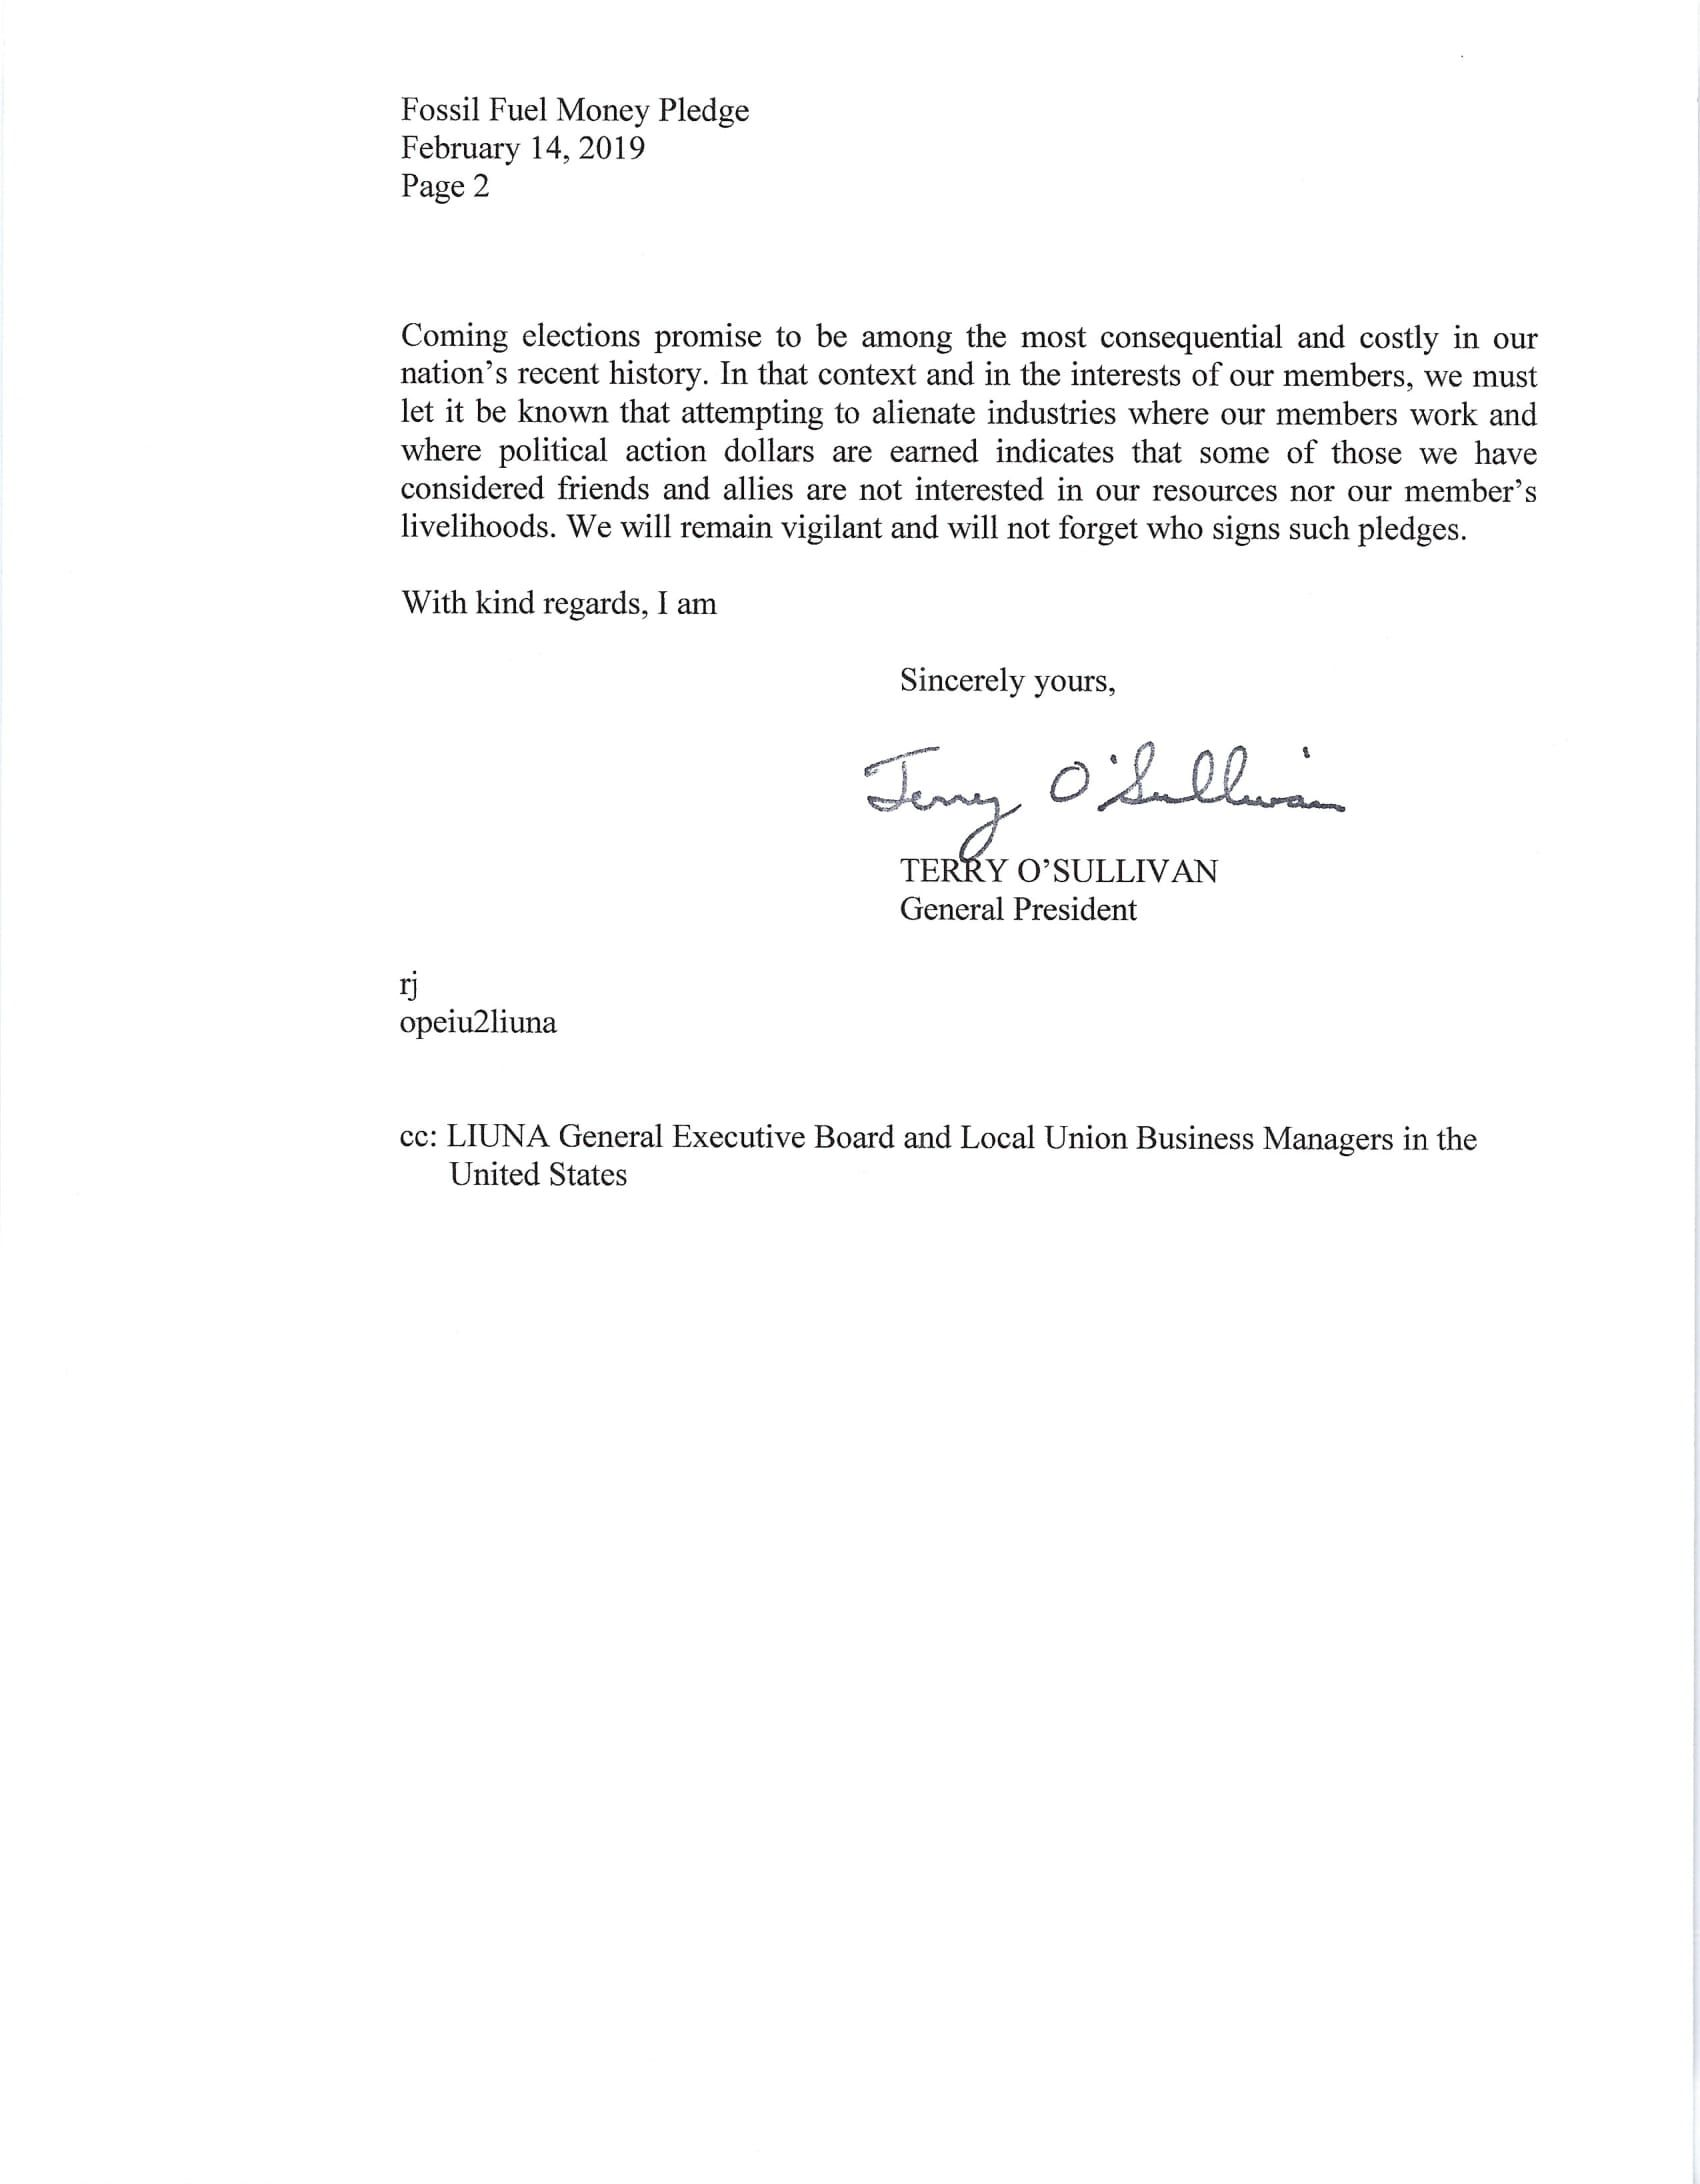 Senate Fossil Fuel Money Pledge Ltr Feb 2019-2.jpg